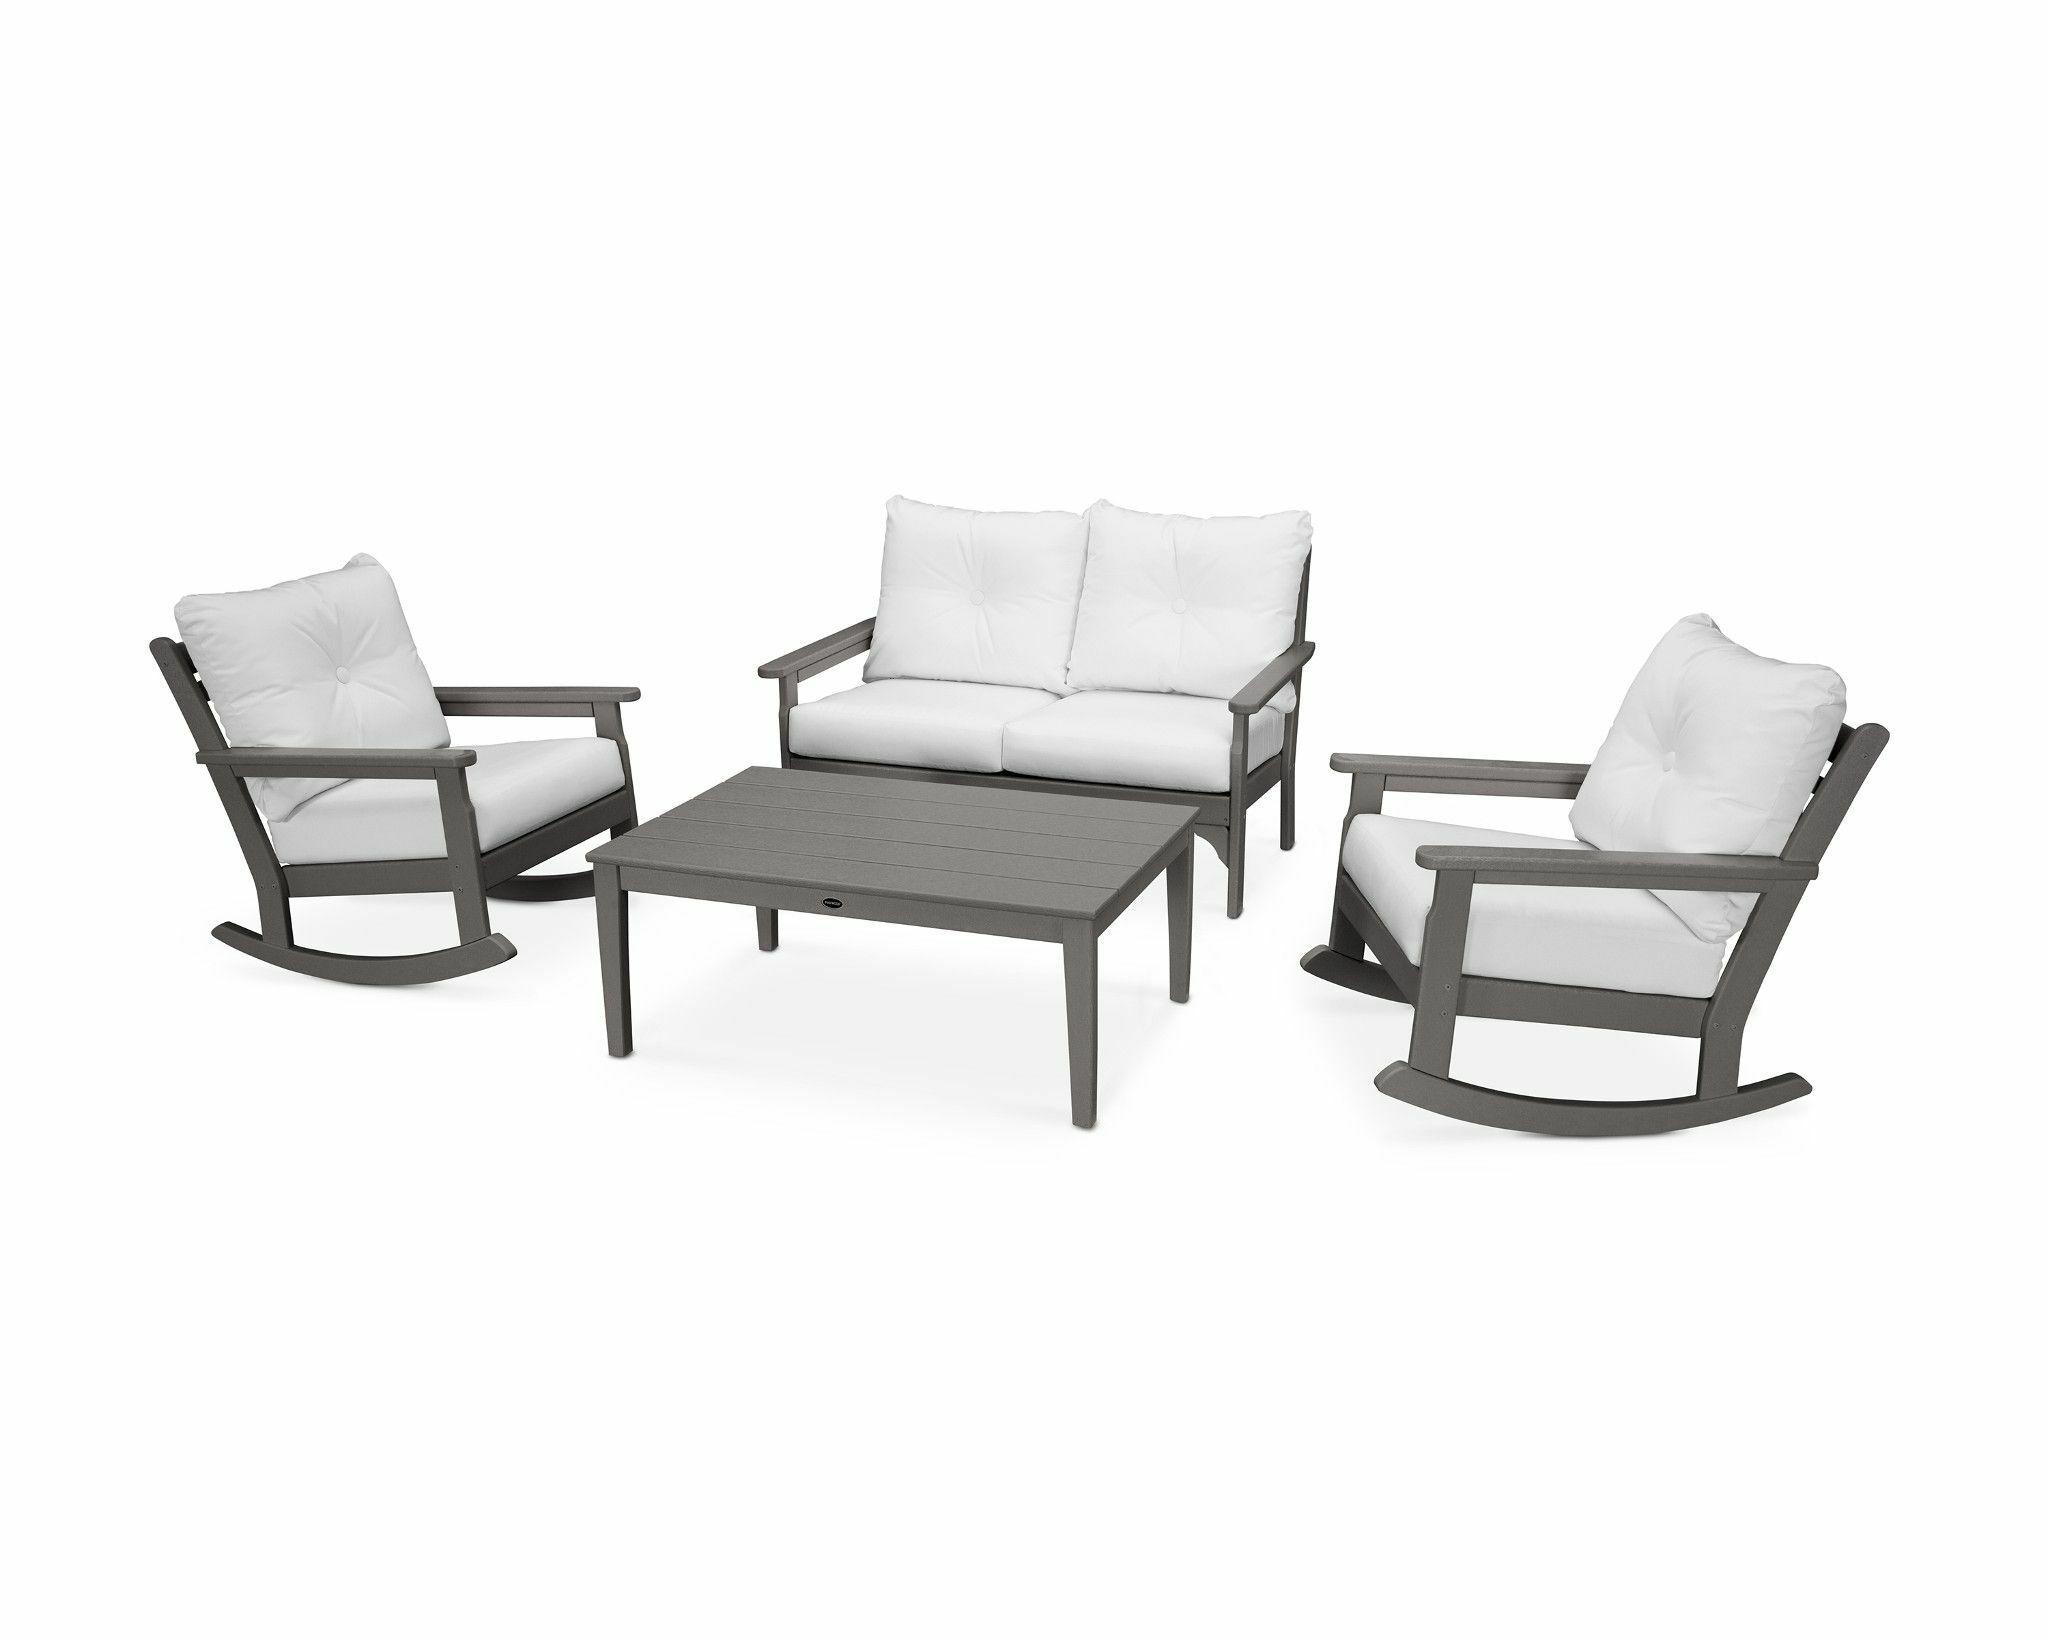 Vineyard 4 Piece Sofa Set with Sunbrella Cushions Frame Finish: Slate Gray, Fabric: Natural